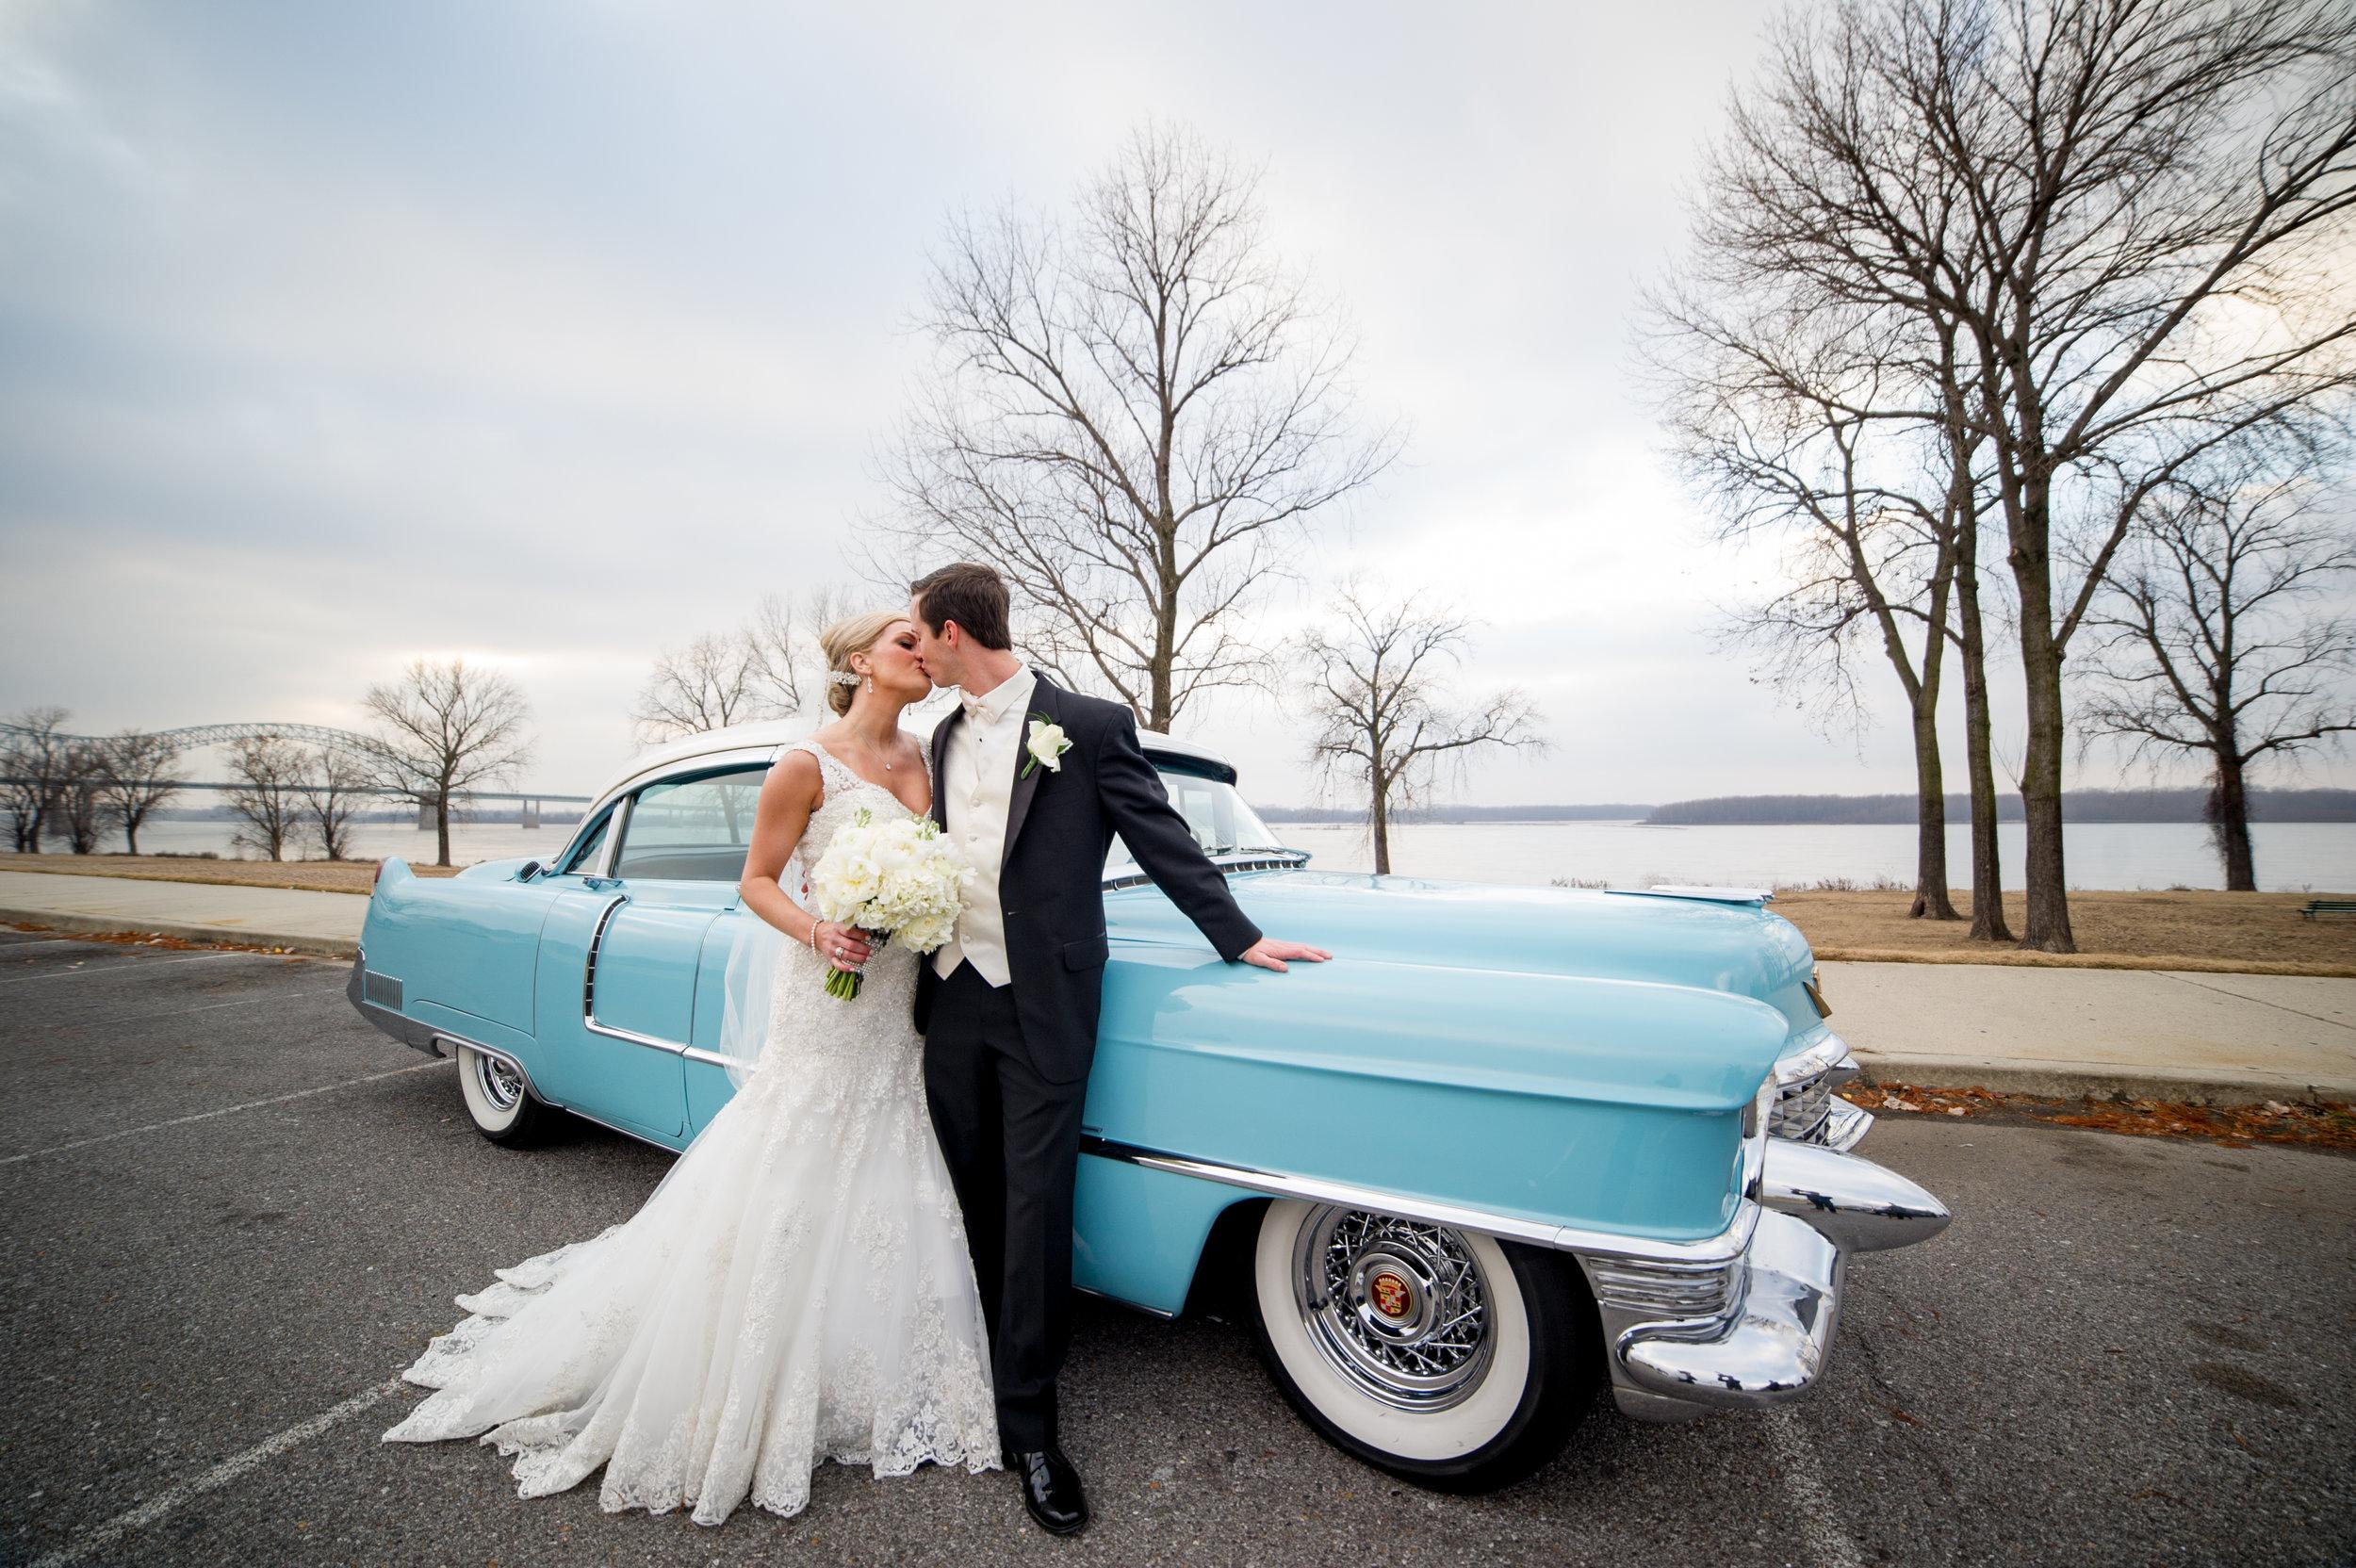 N-T-wedding-0048-DSC_2713.jpg